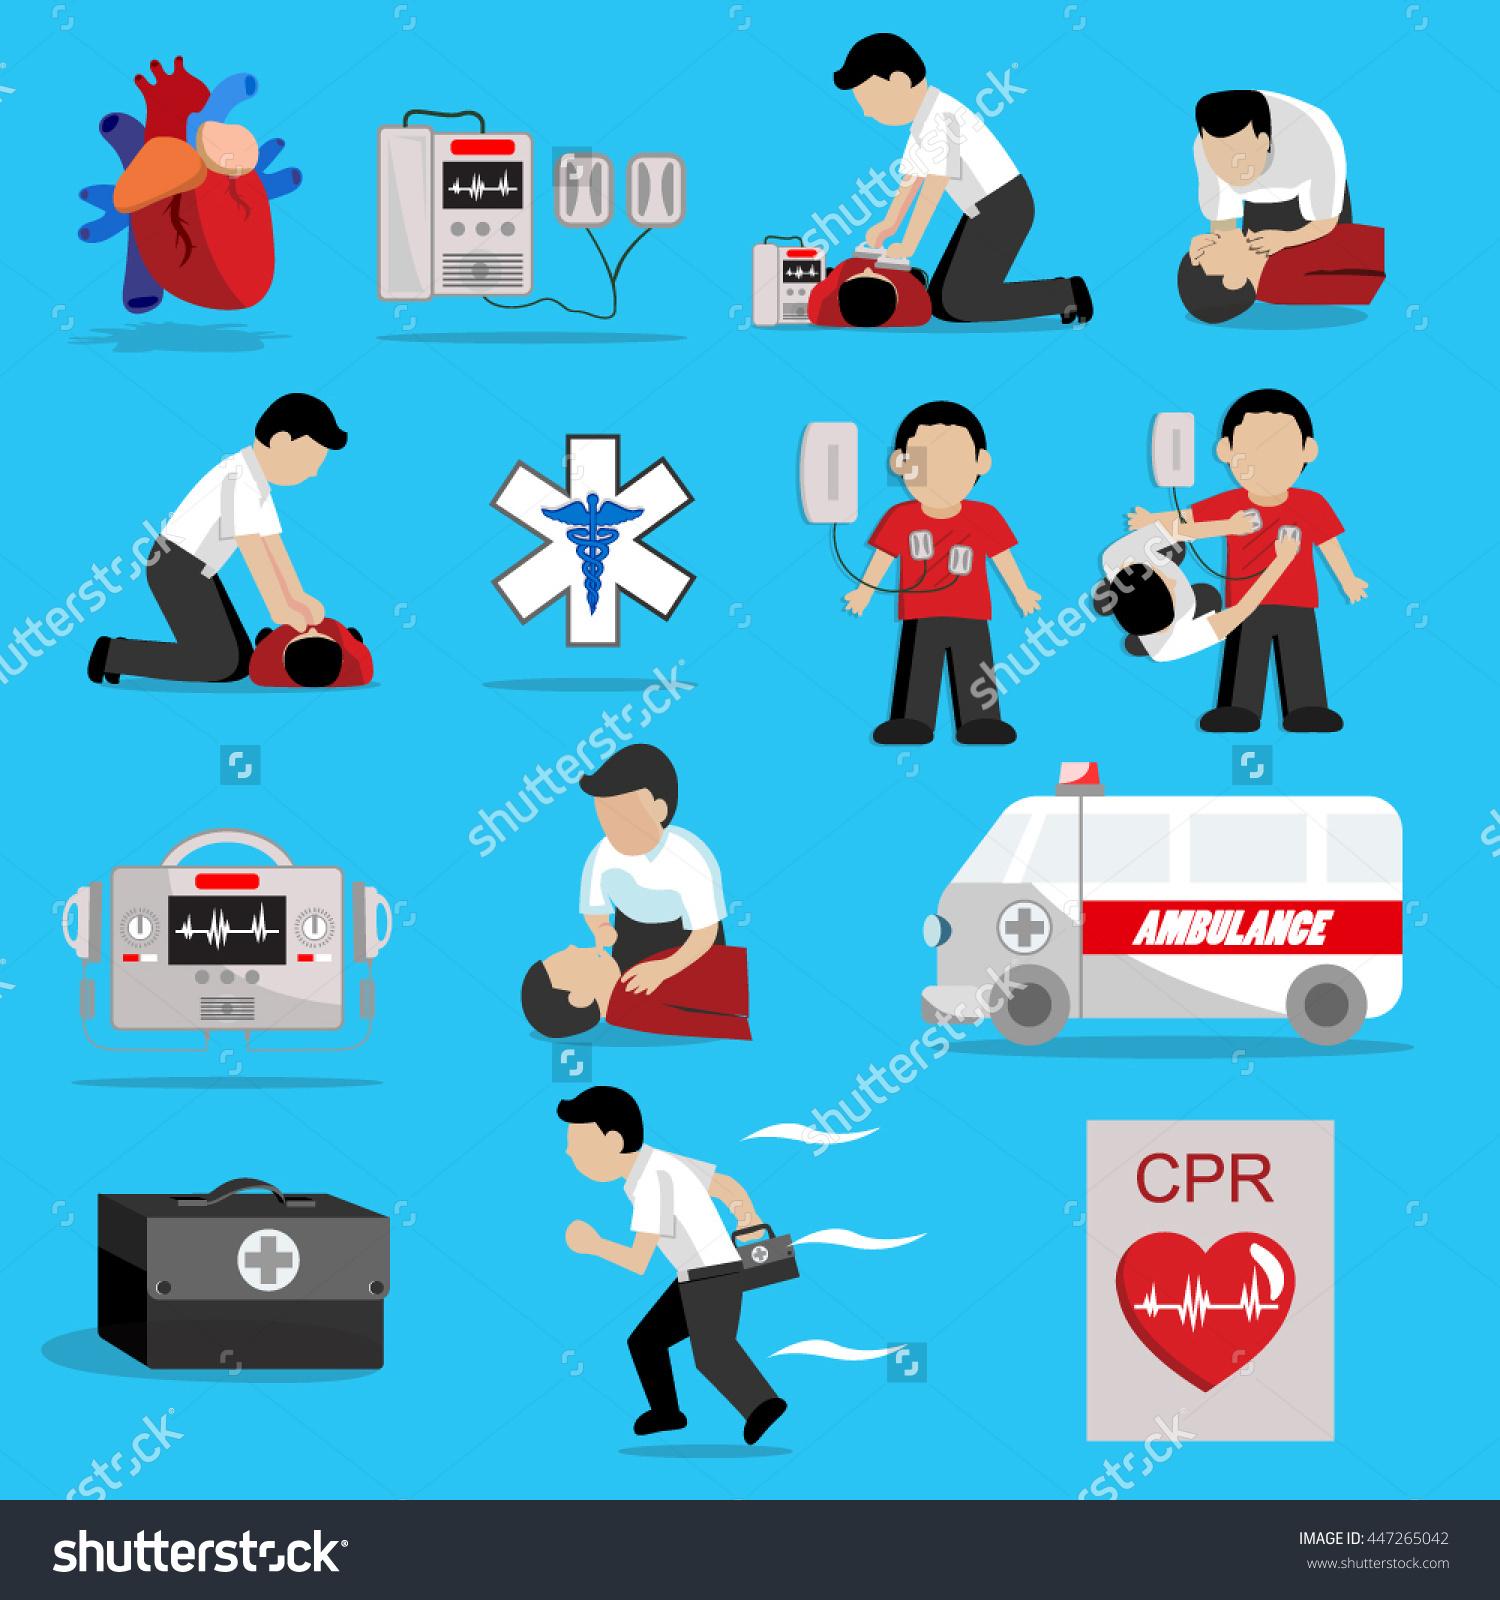 Cpr Cardiopulmonary Resuscitation Basic Life Support Stock Vector.